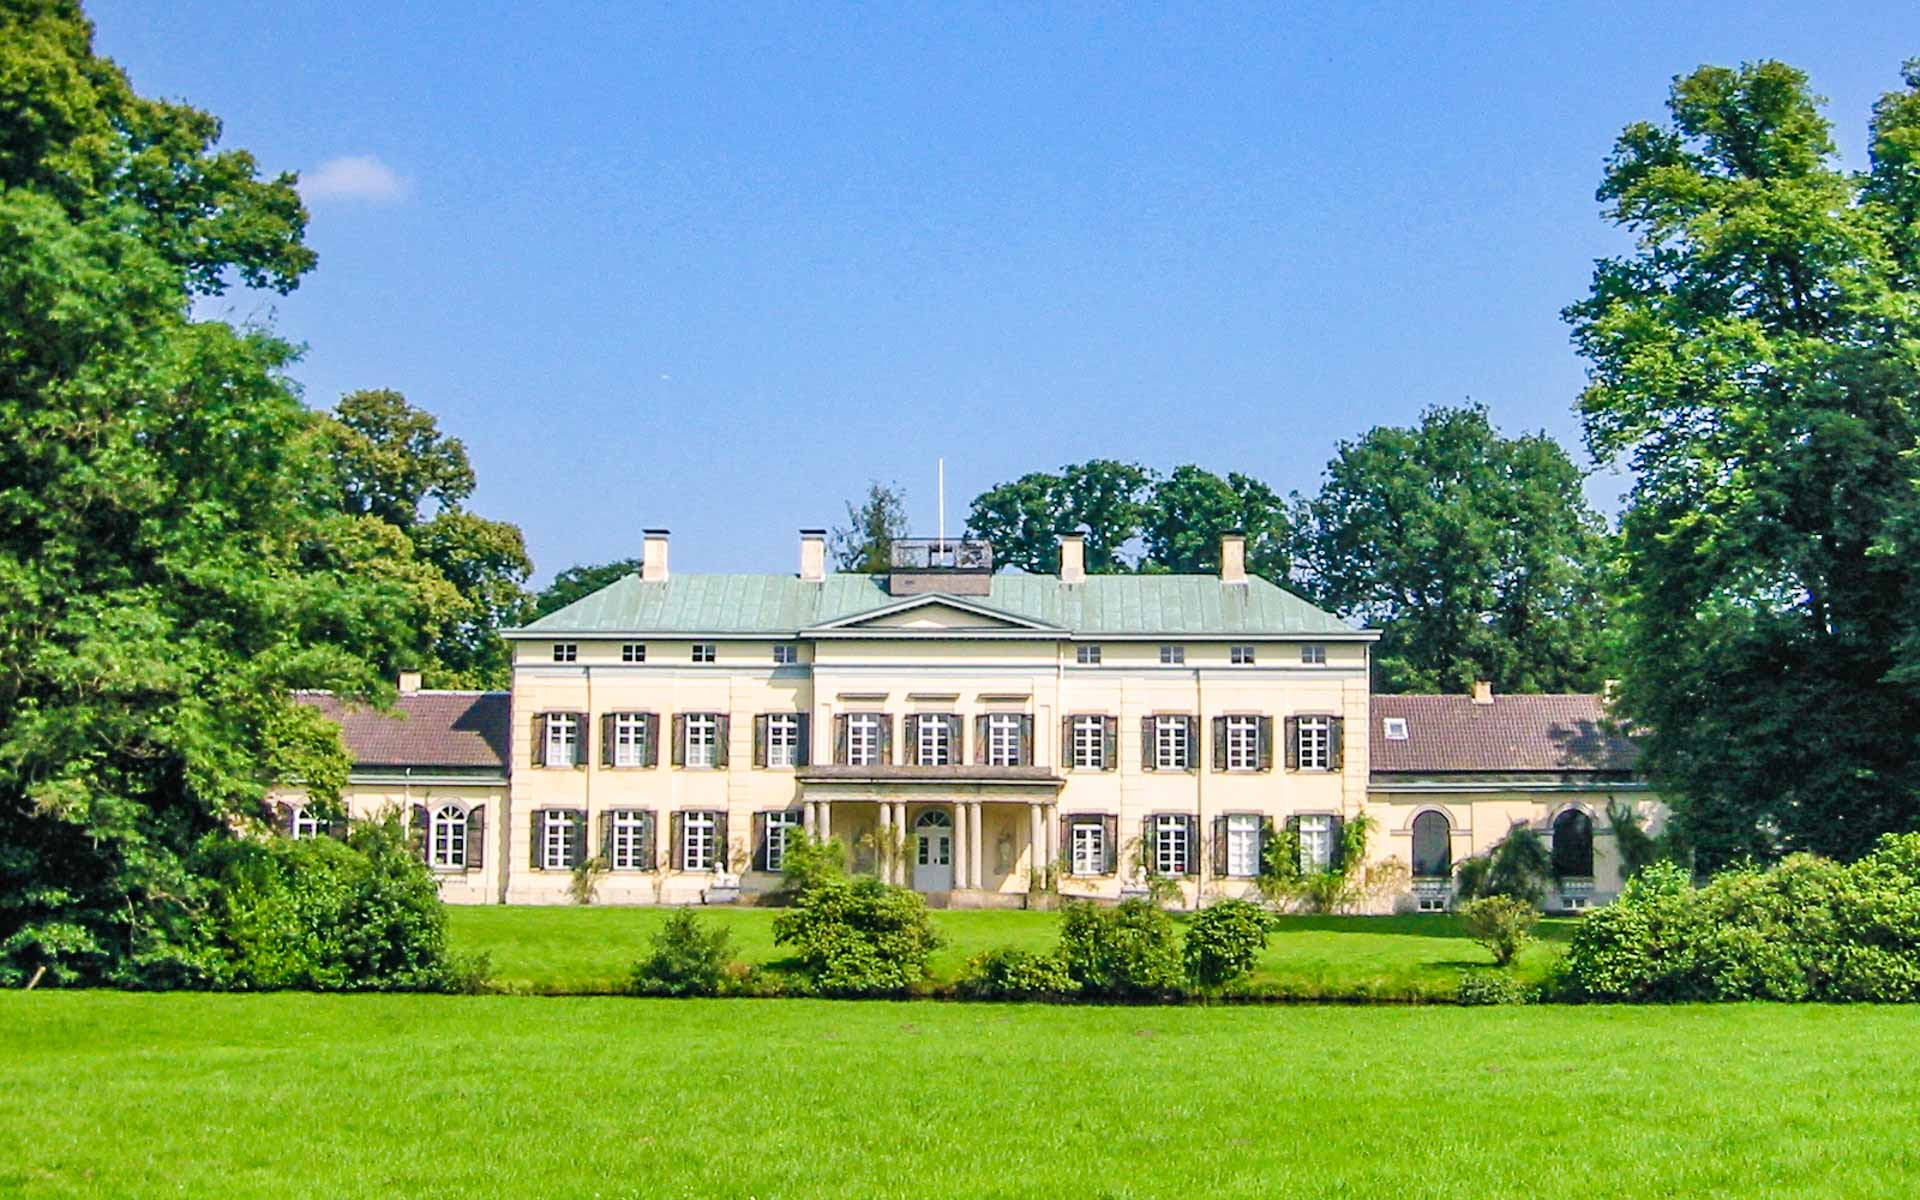 Fisbeck Ferienwohnungen Rastede Schloss Rastede